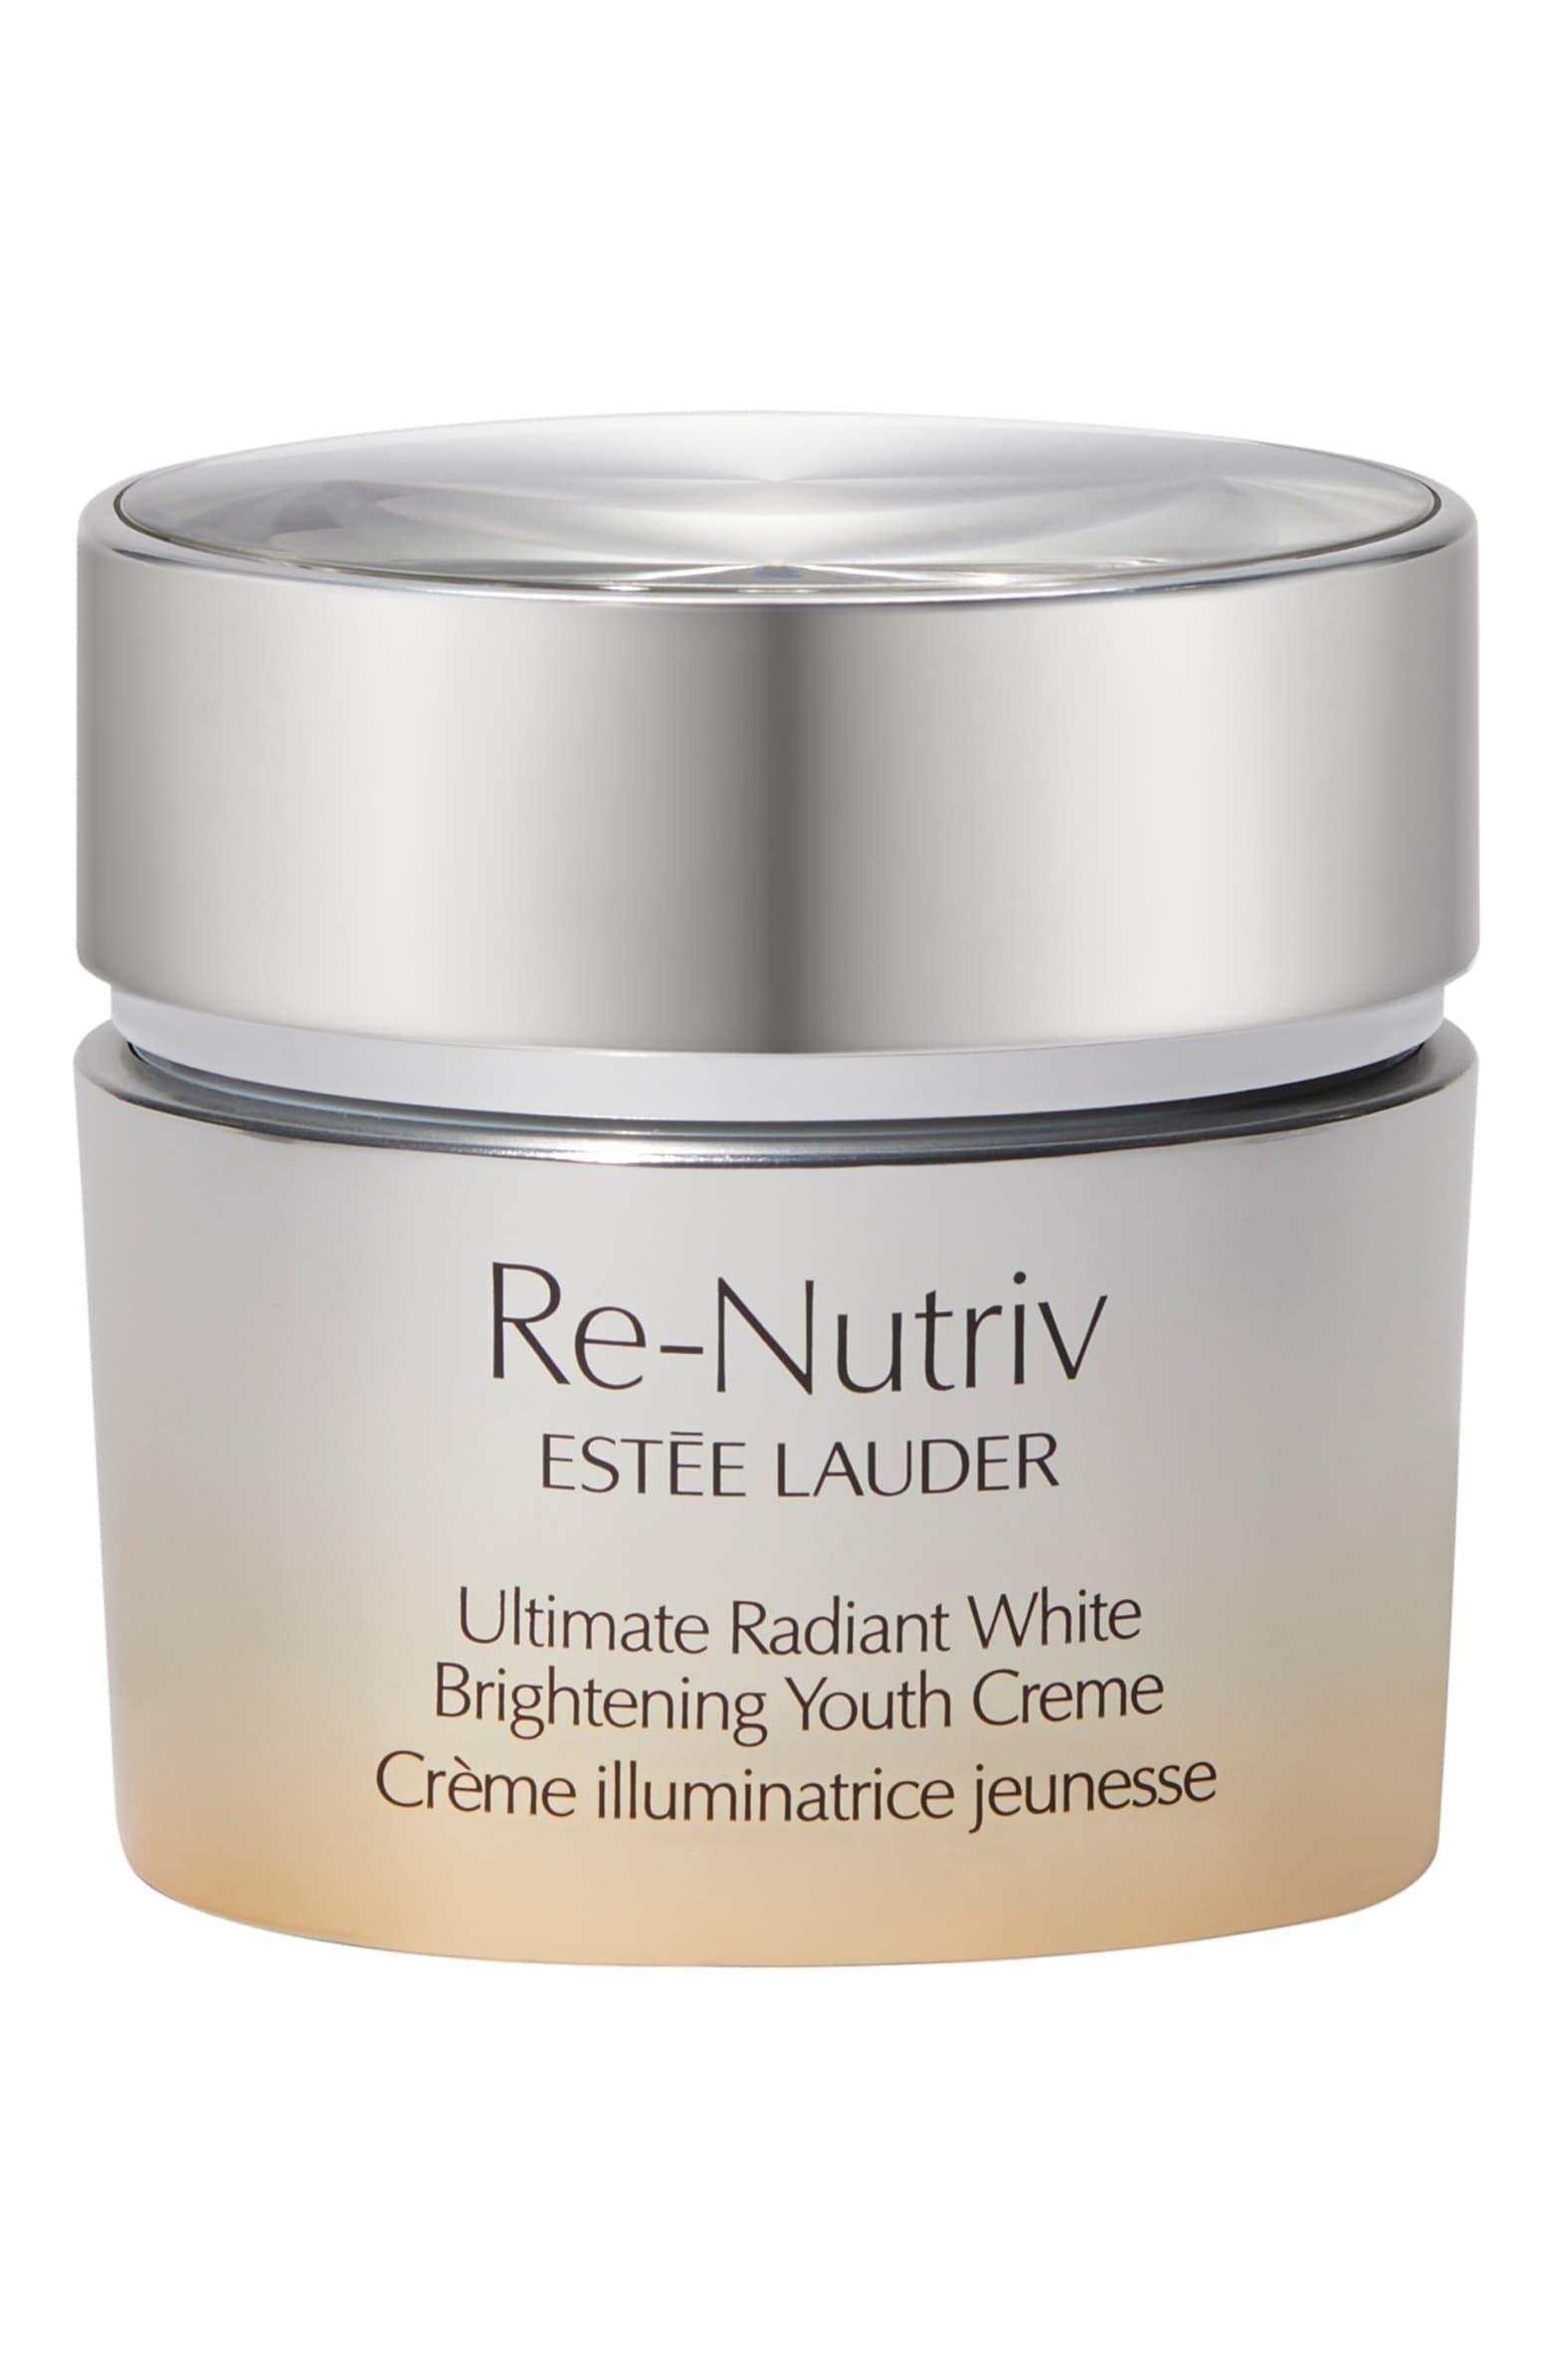 Estee Lauder Re Nutriv Ultimate Radiance White Brightening Youth Cream In 2020 Estee Lauder Cream How To Apply